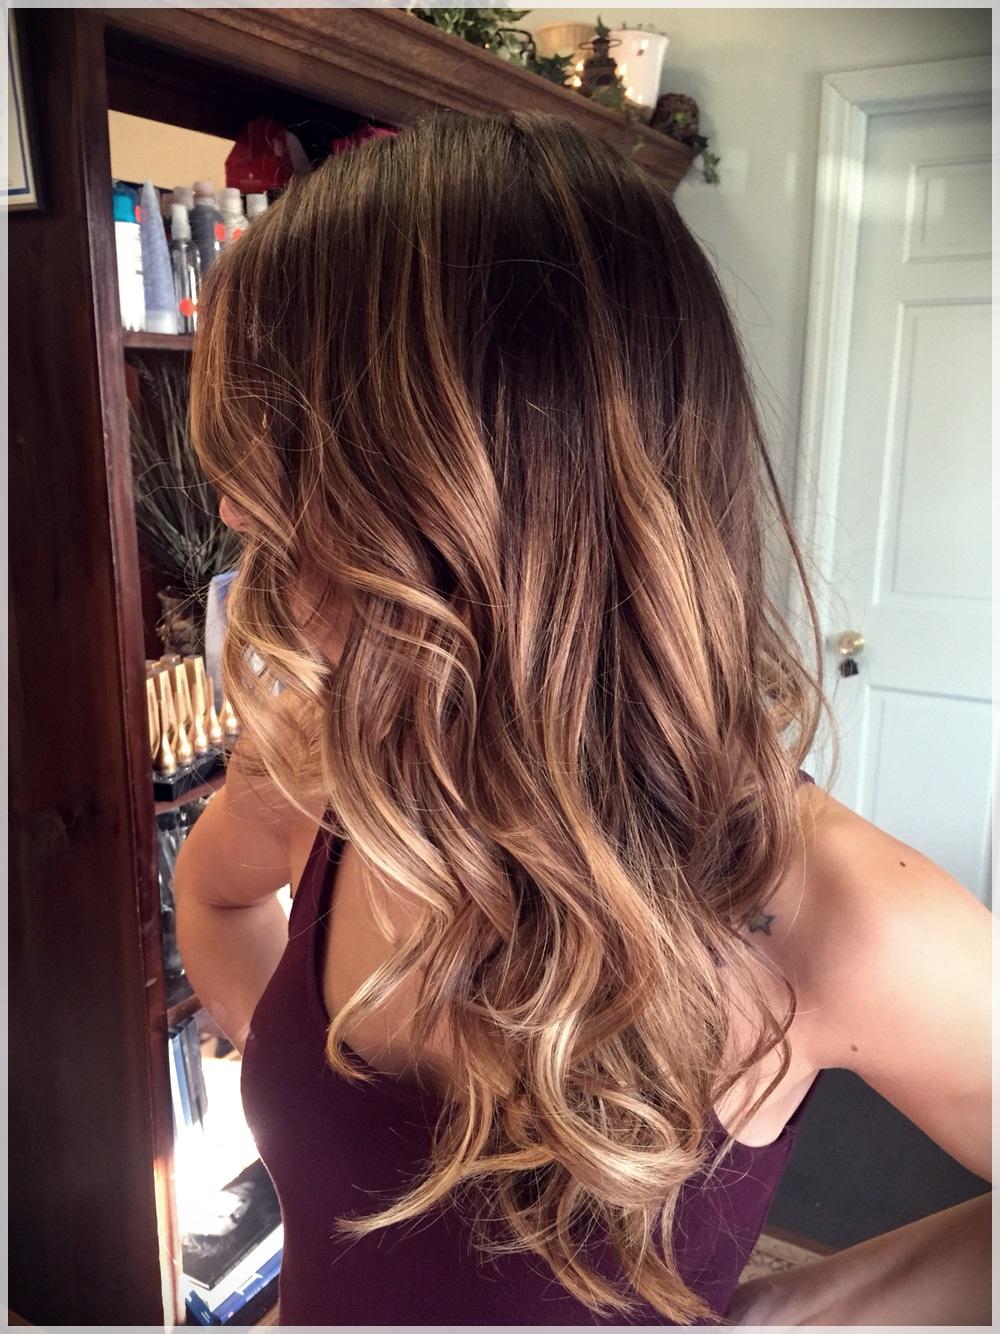 caramel brown hair color ideas 10 - Rocking caramel brown hair color